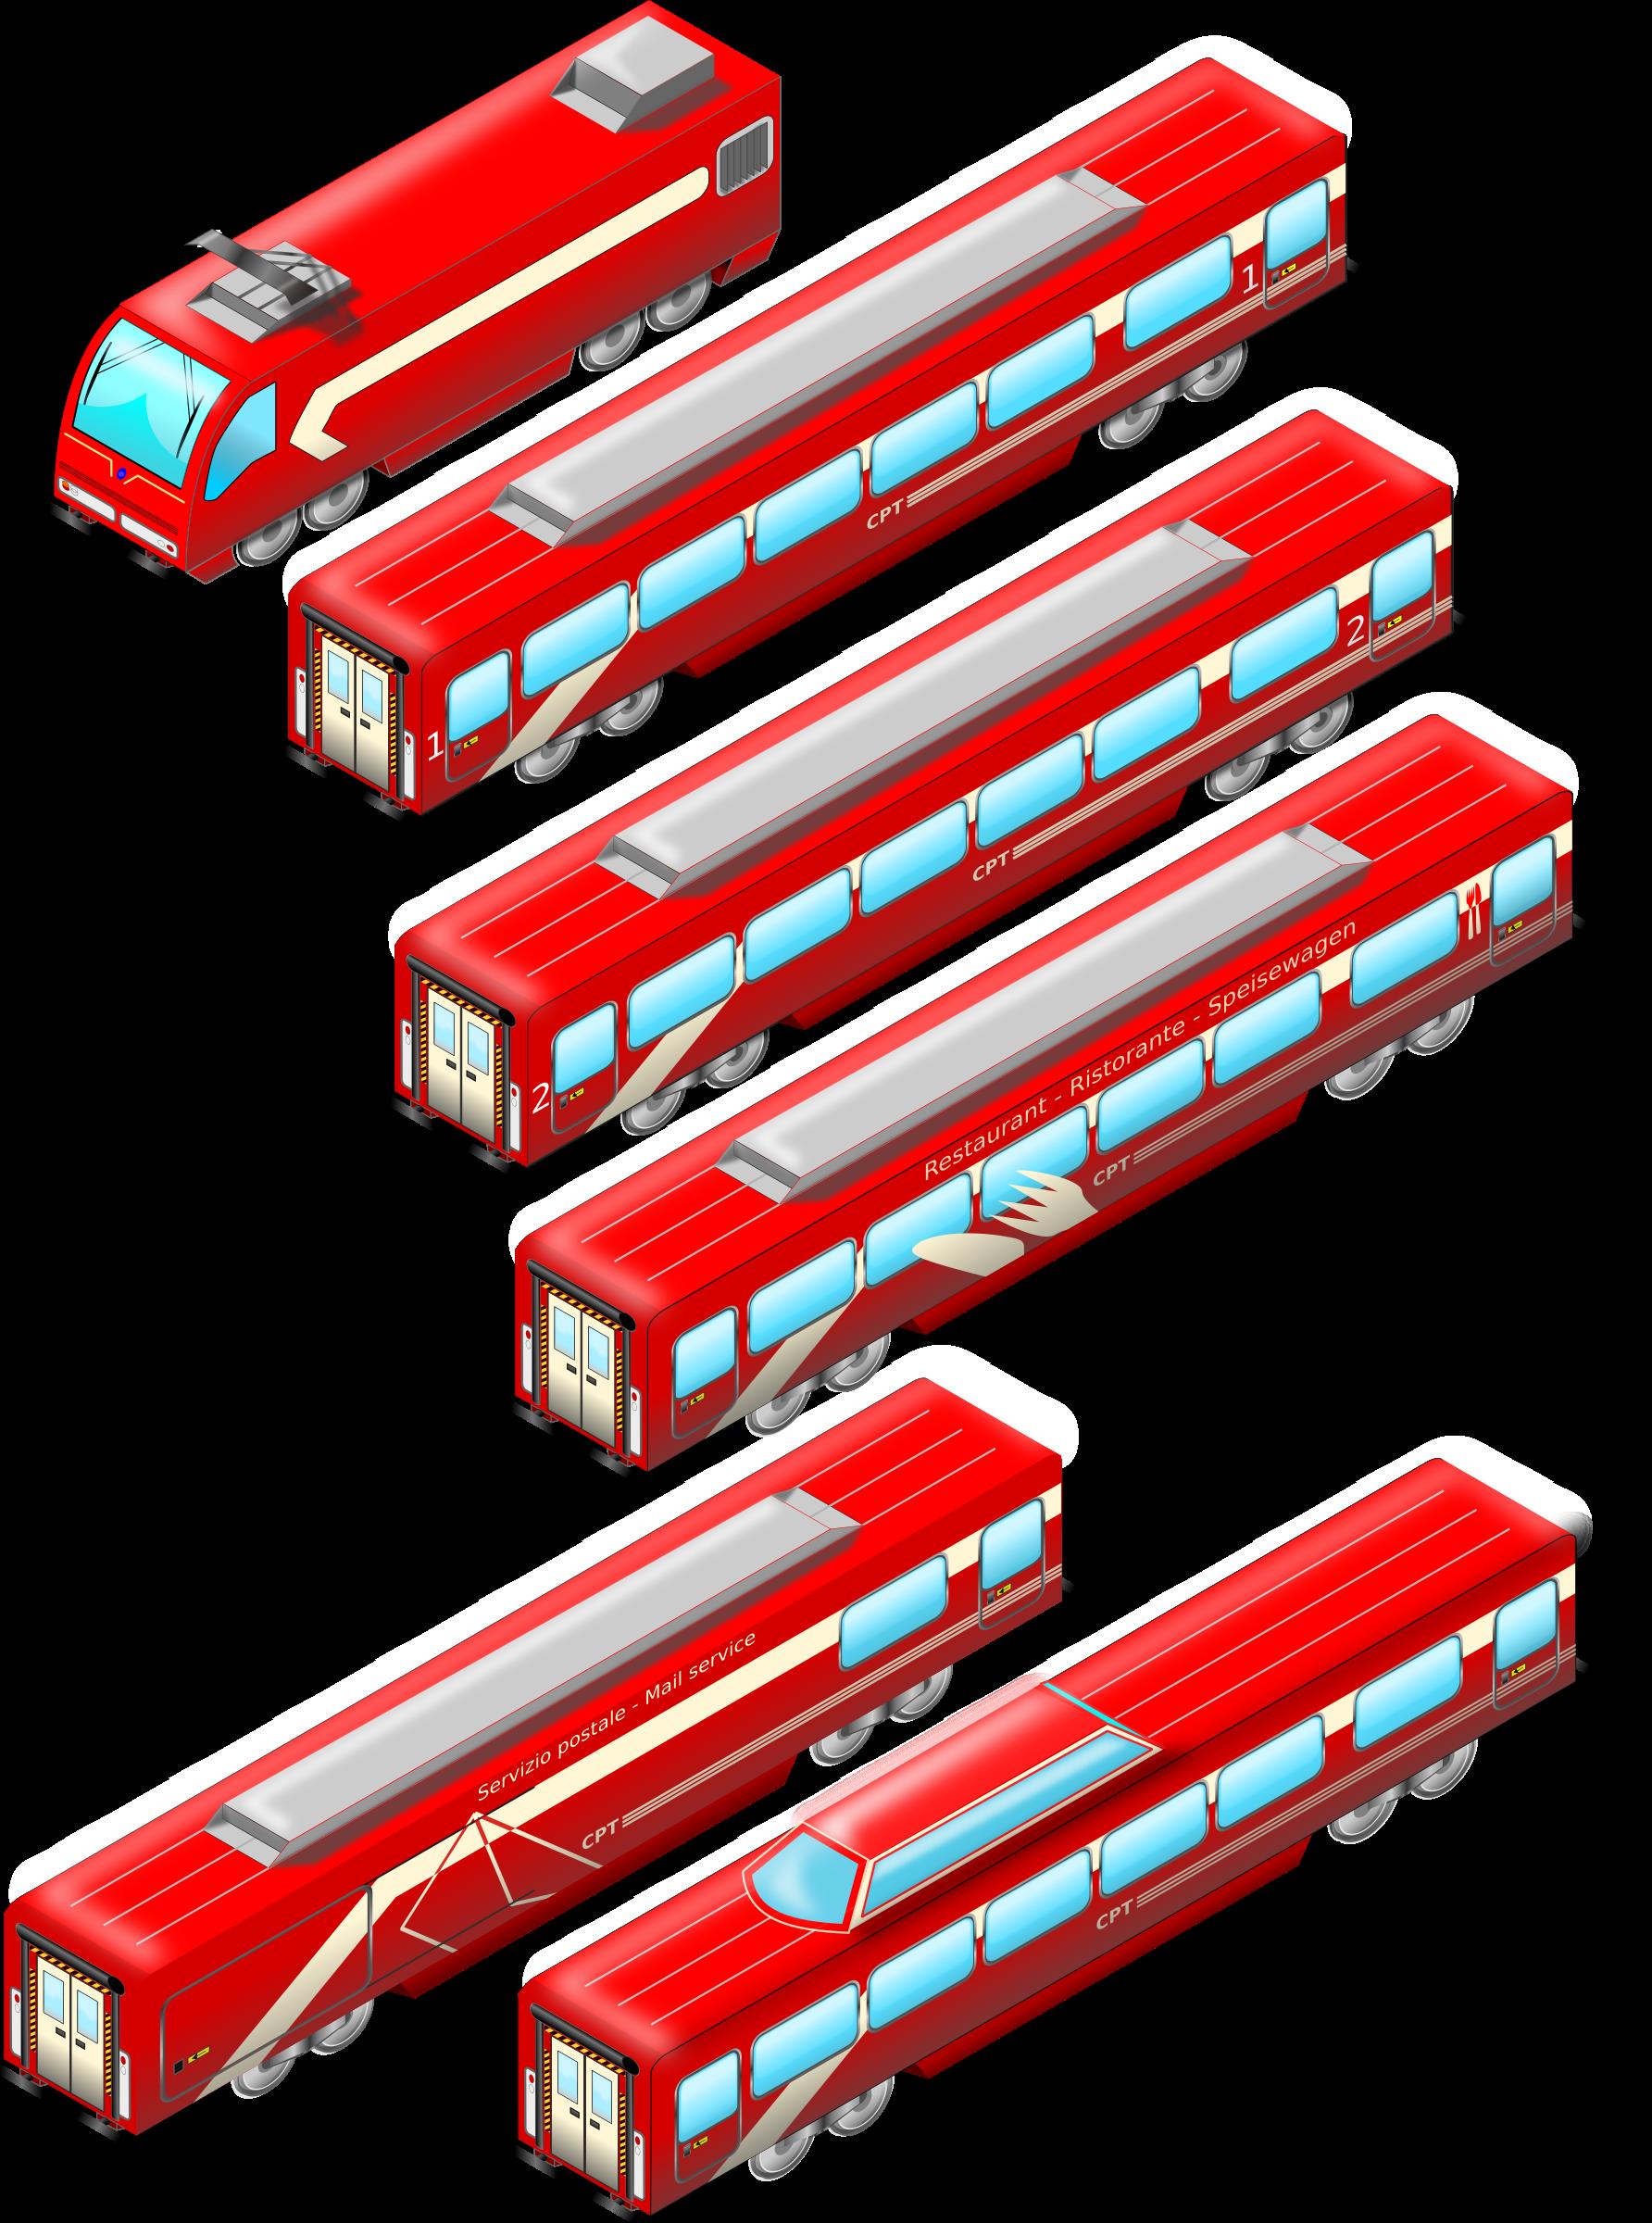 Intercity Rosso v.1.1 by zerocinquanta